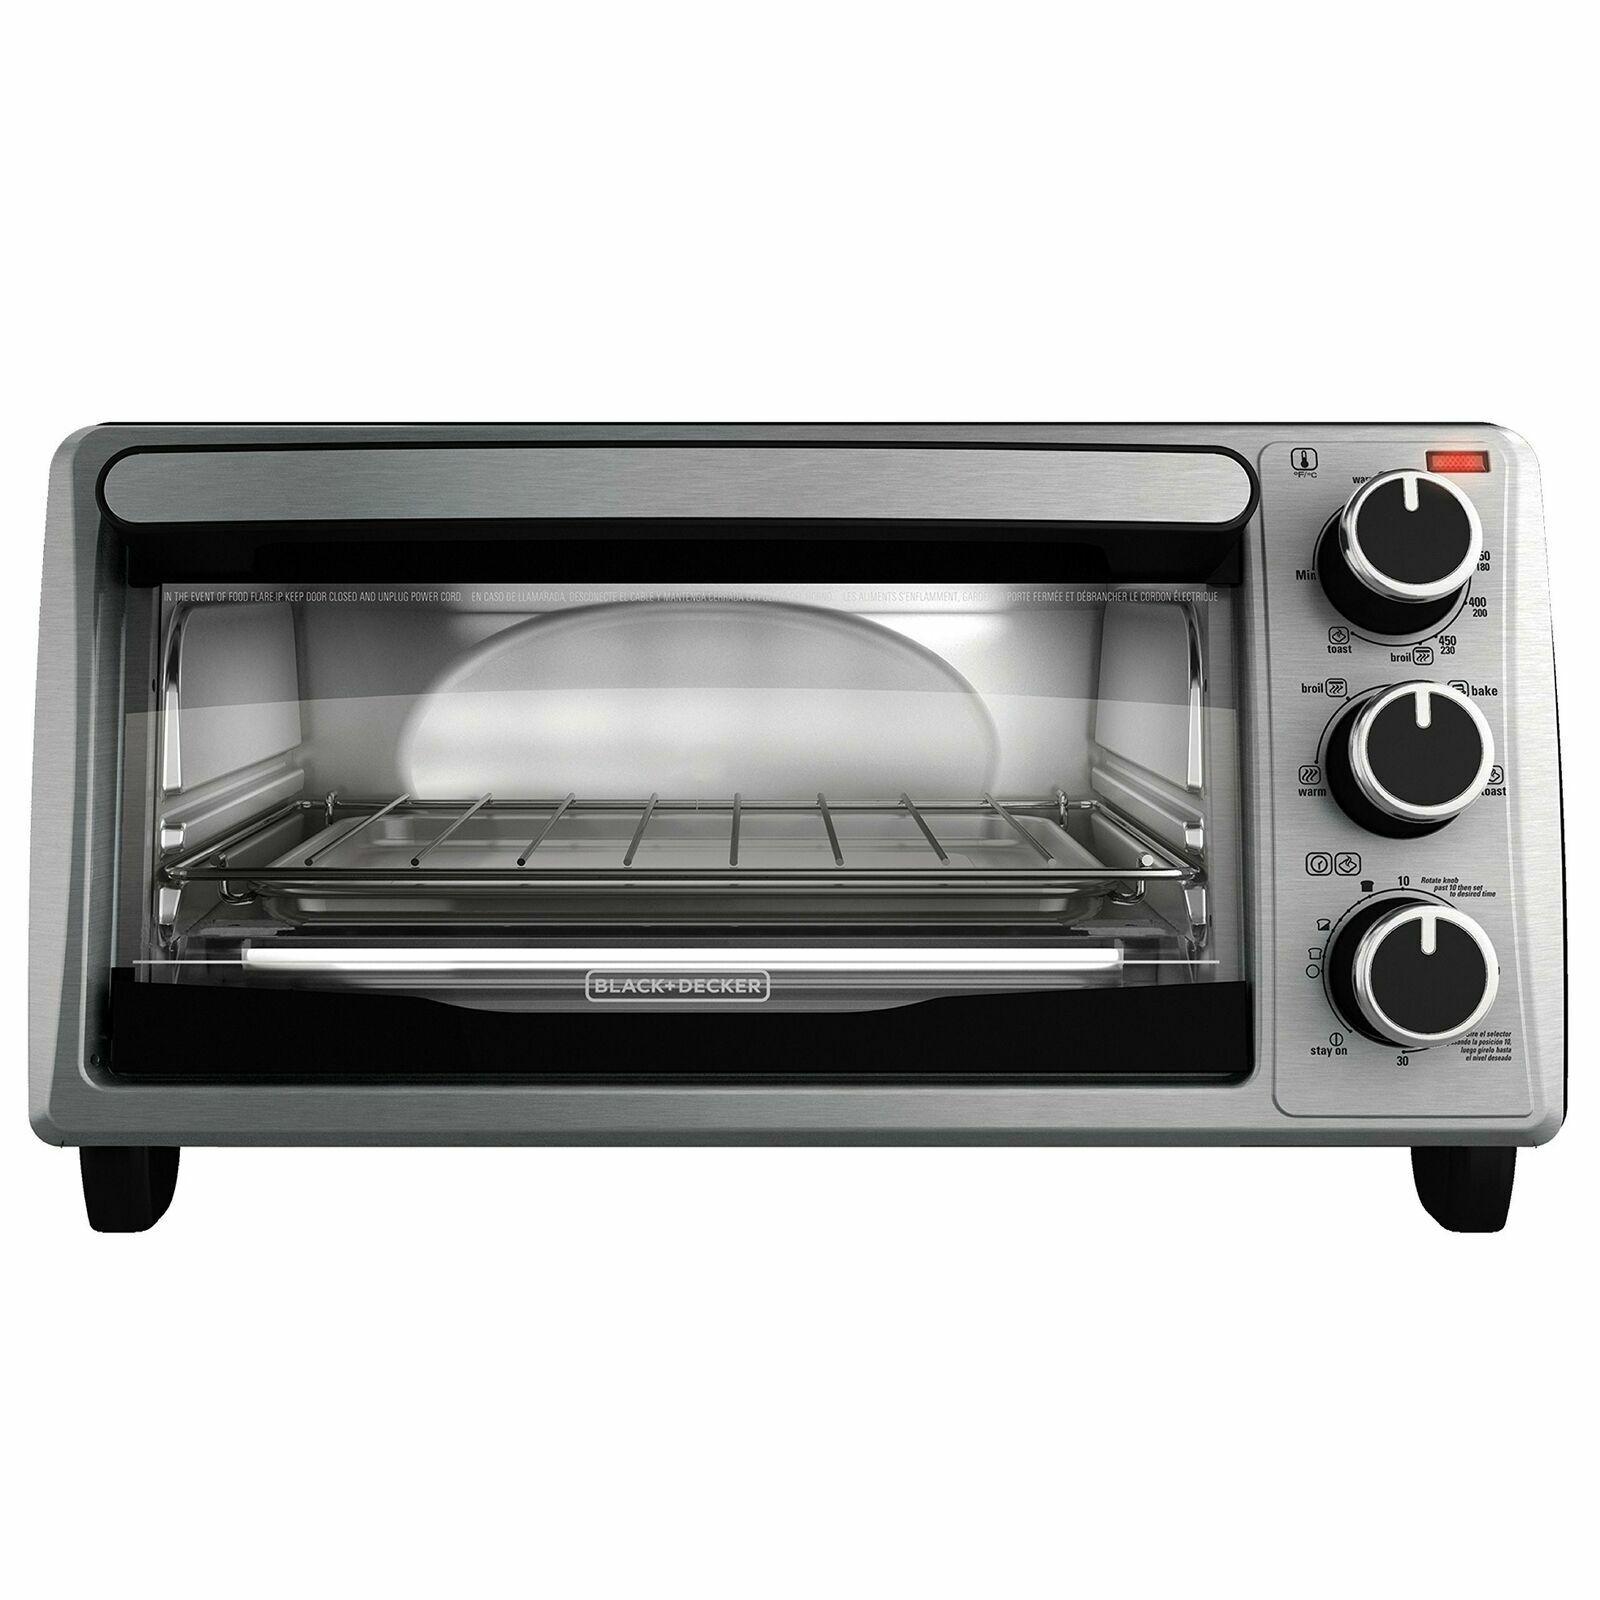 BLACK+DECKER TO1303SB 4-Slice Toaster Oven, Stainless Steel